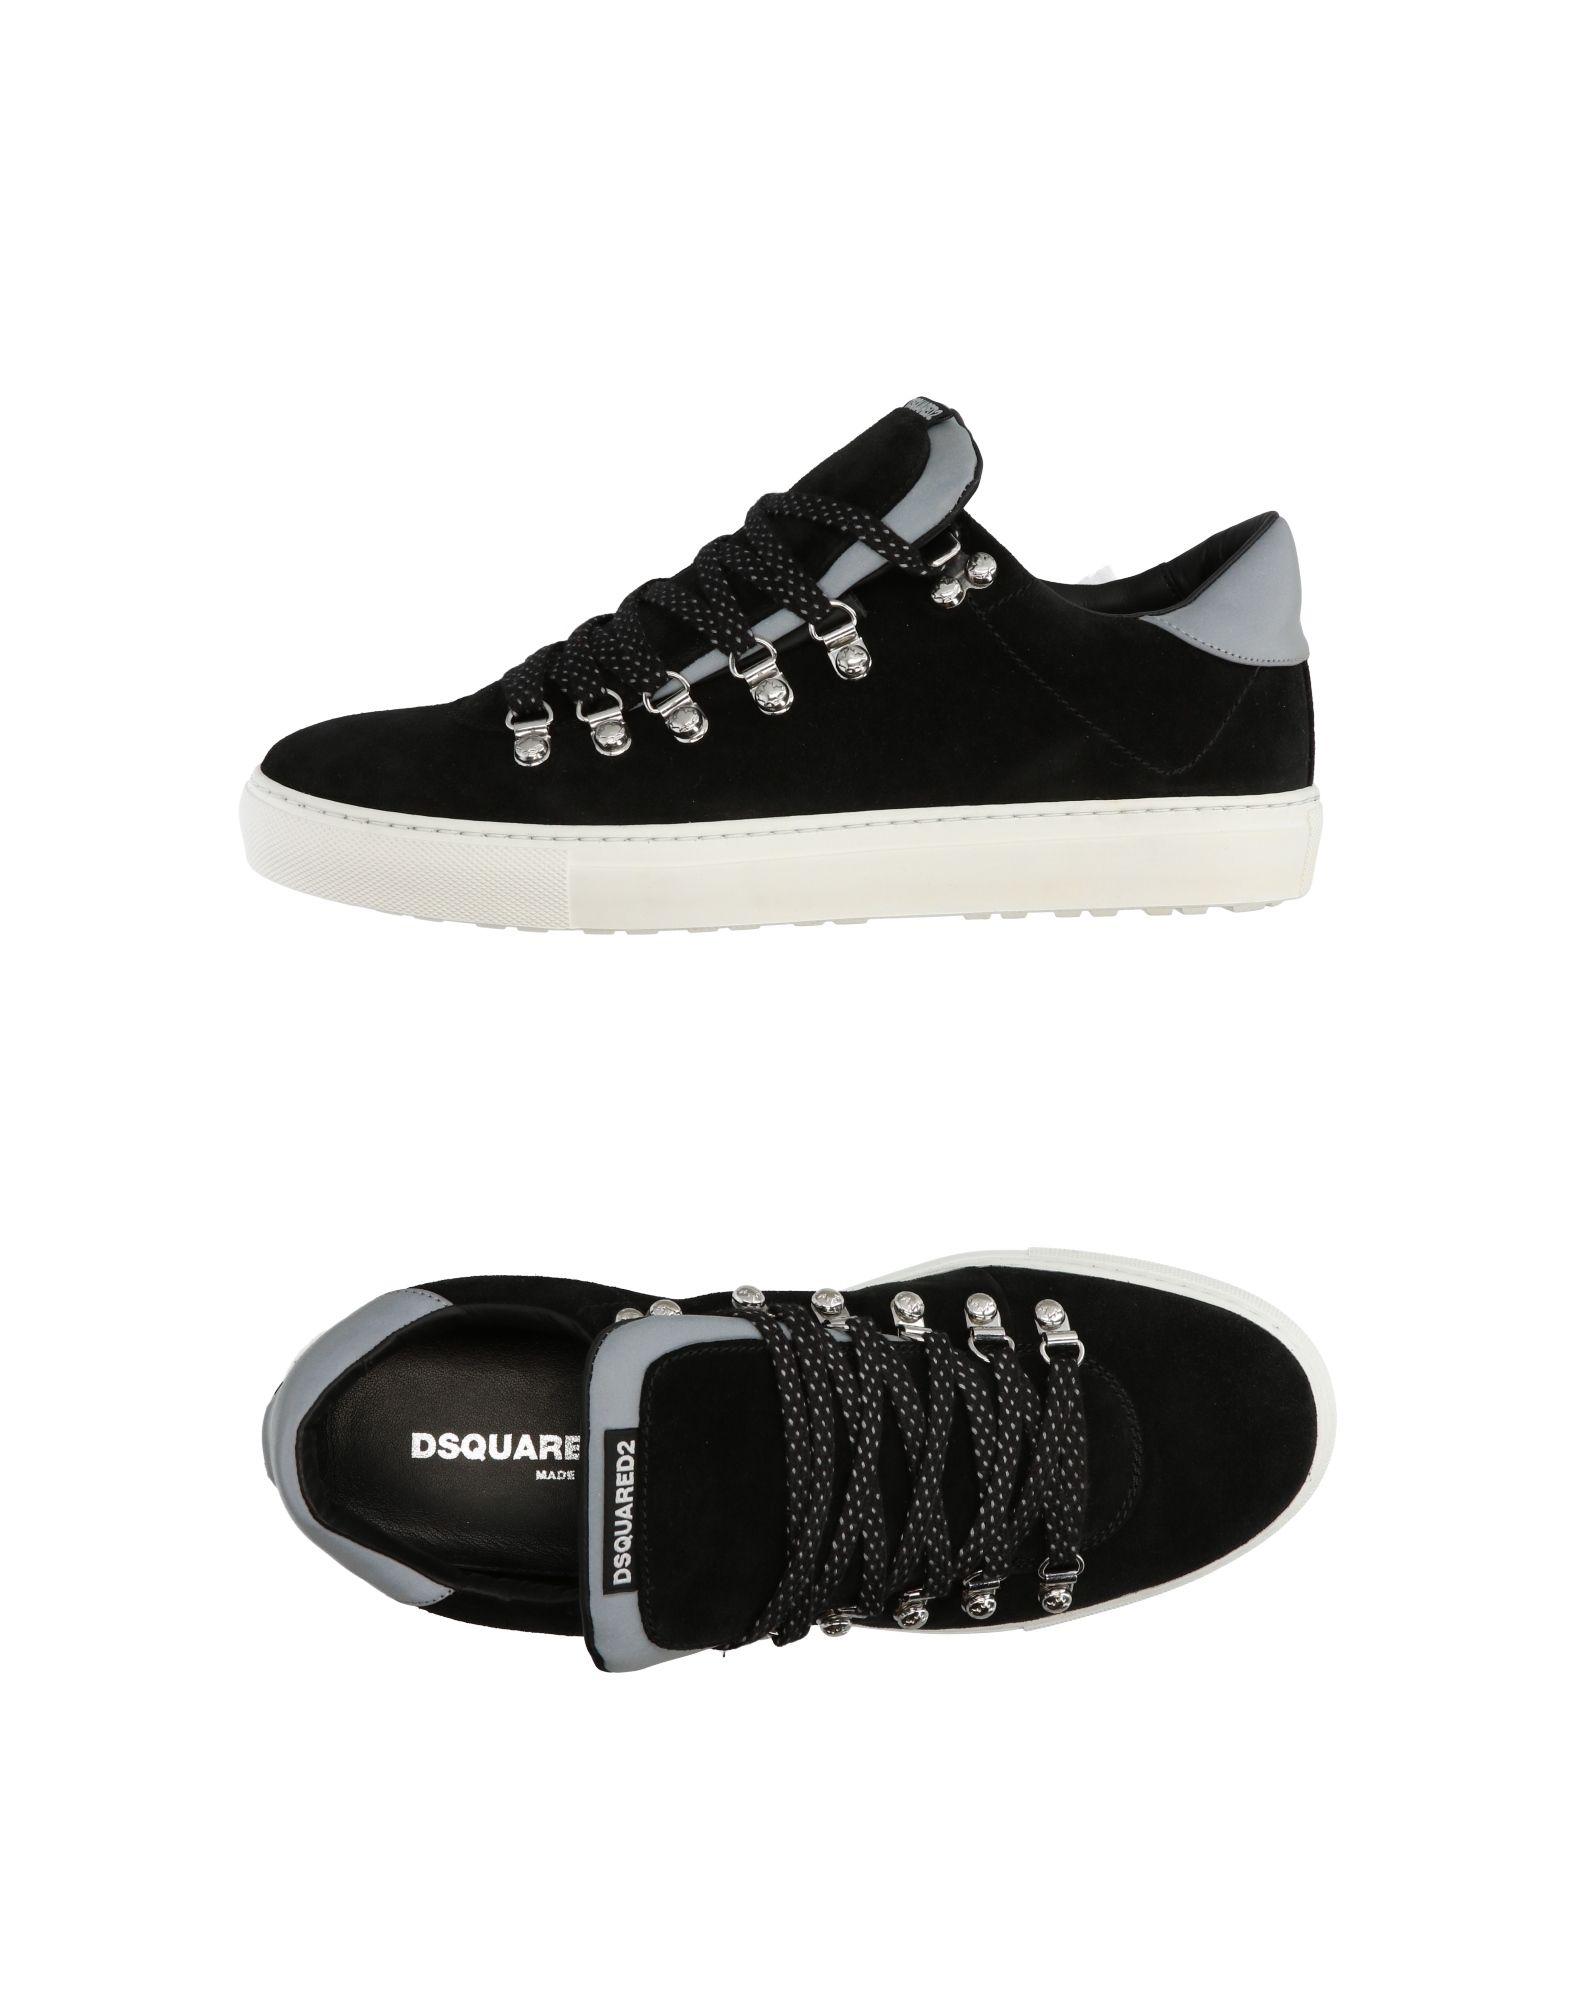 Dsquared2 Sneakers Herren  11298701DU Gute Qualität beliebte Schuhe